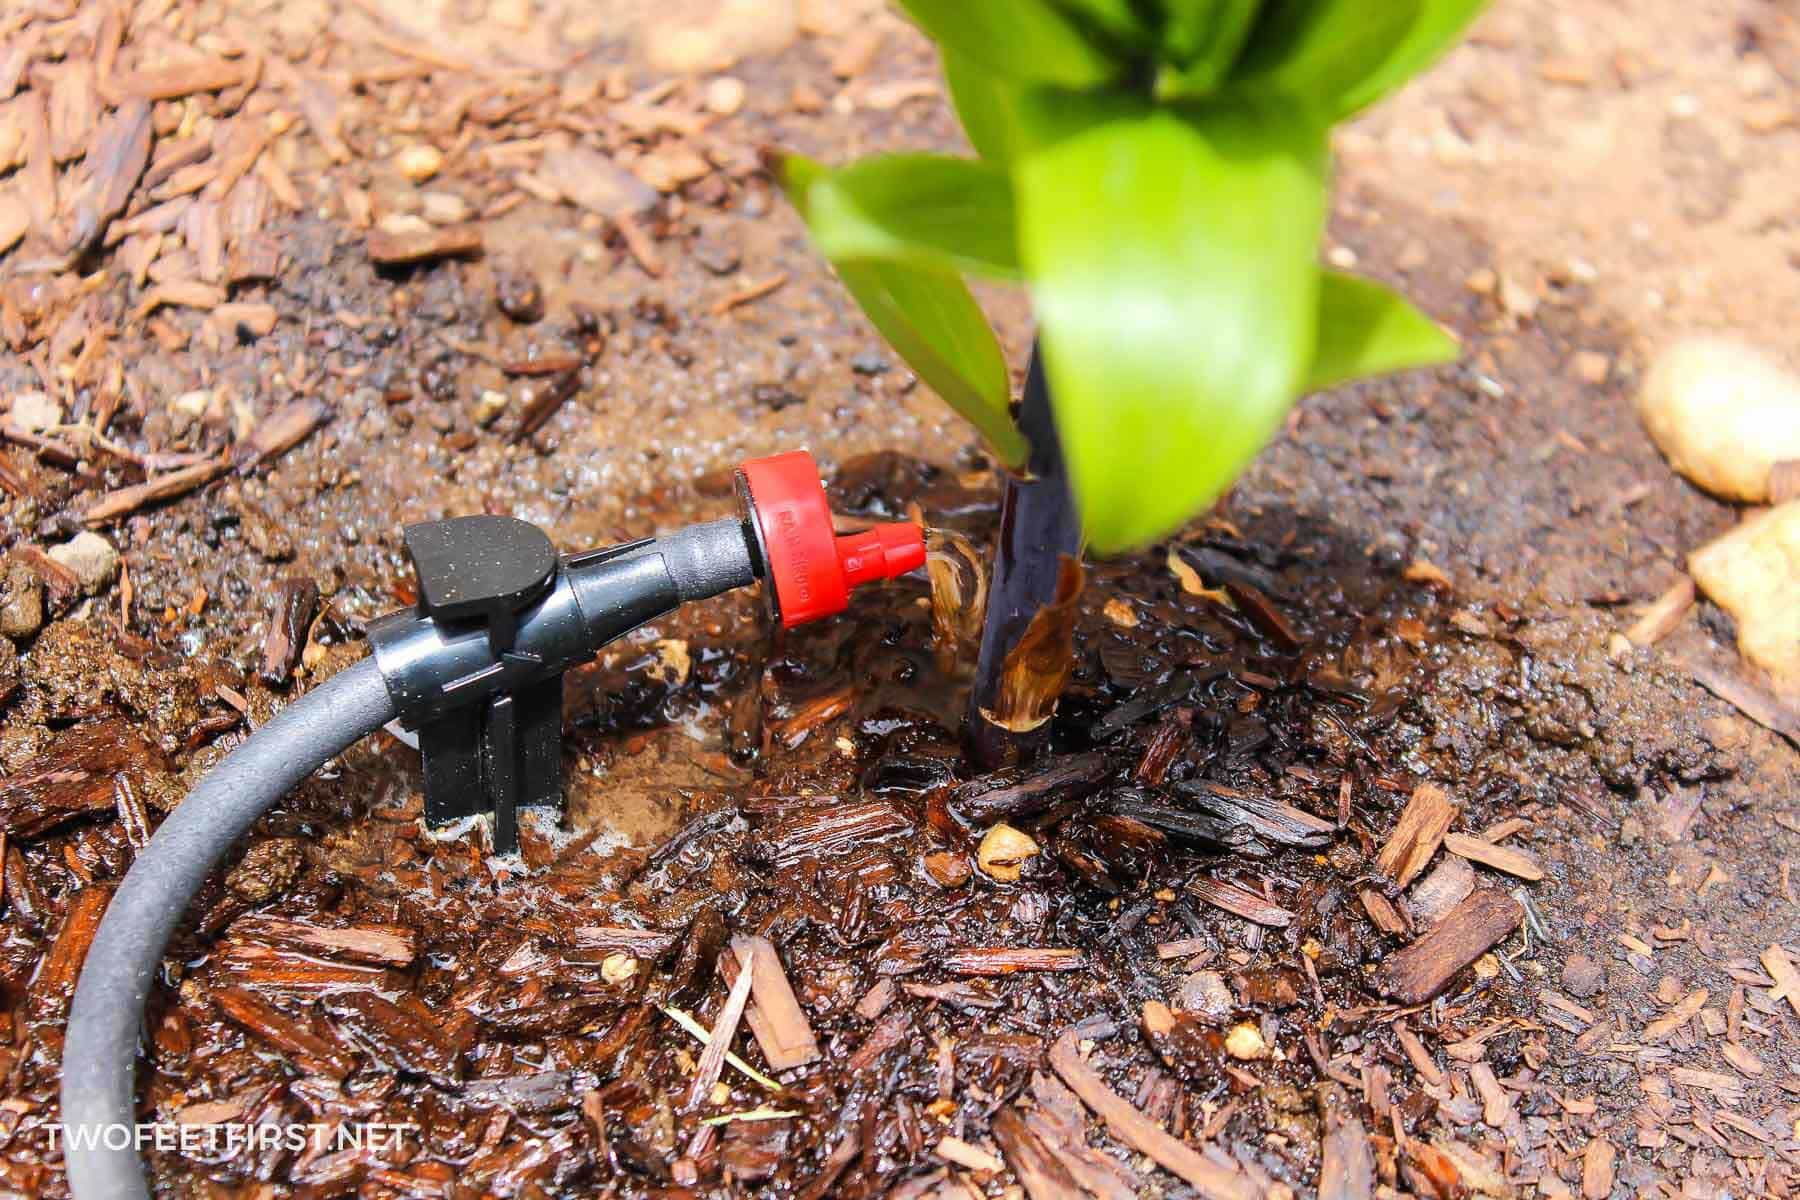 drip irrigation system working